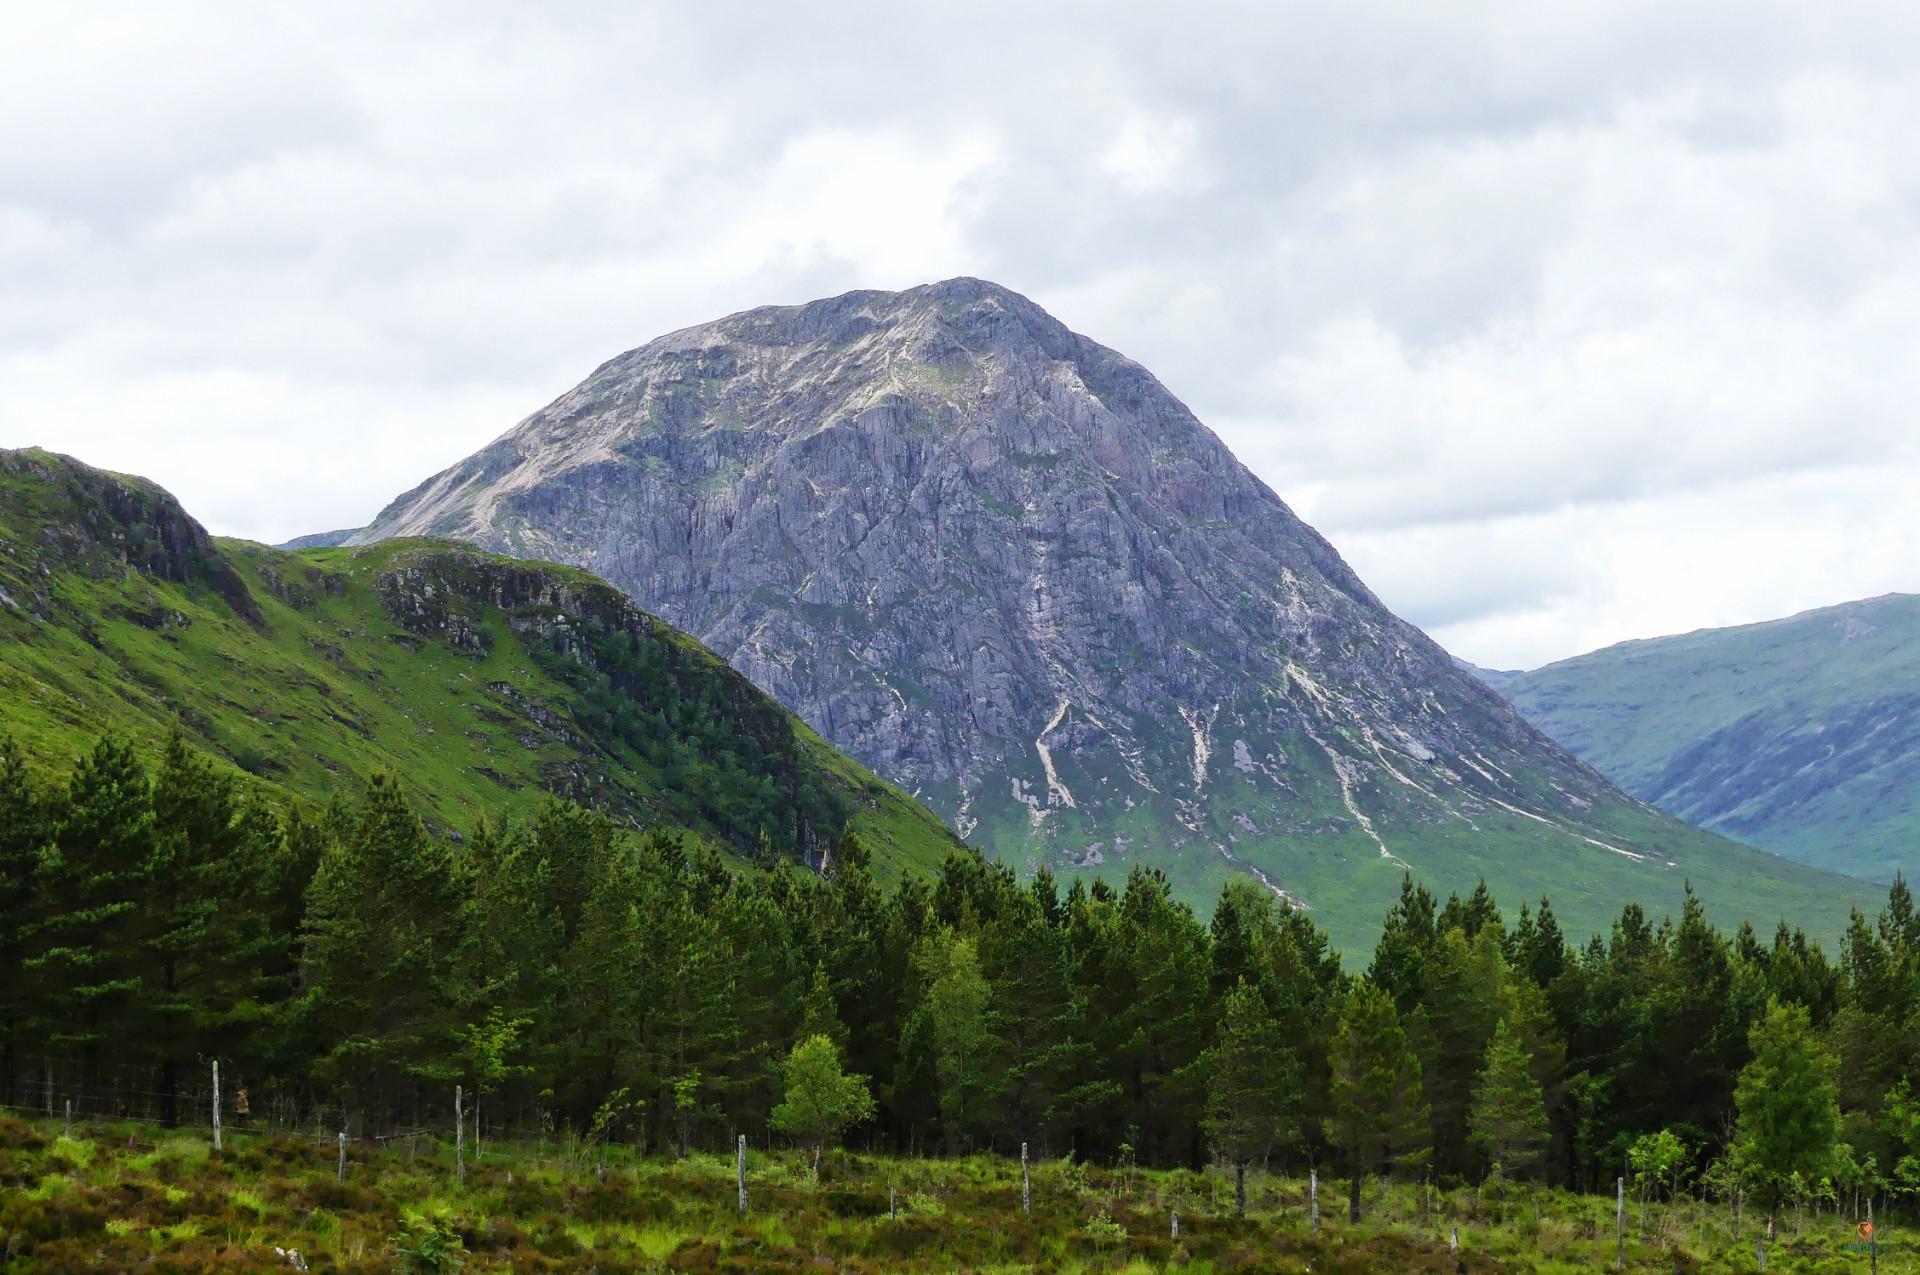 Montaña en Glencoe, en plenas Highlands escocesas.